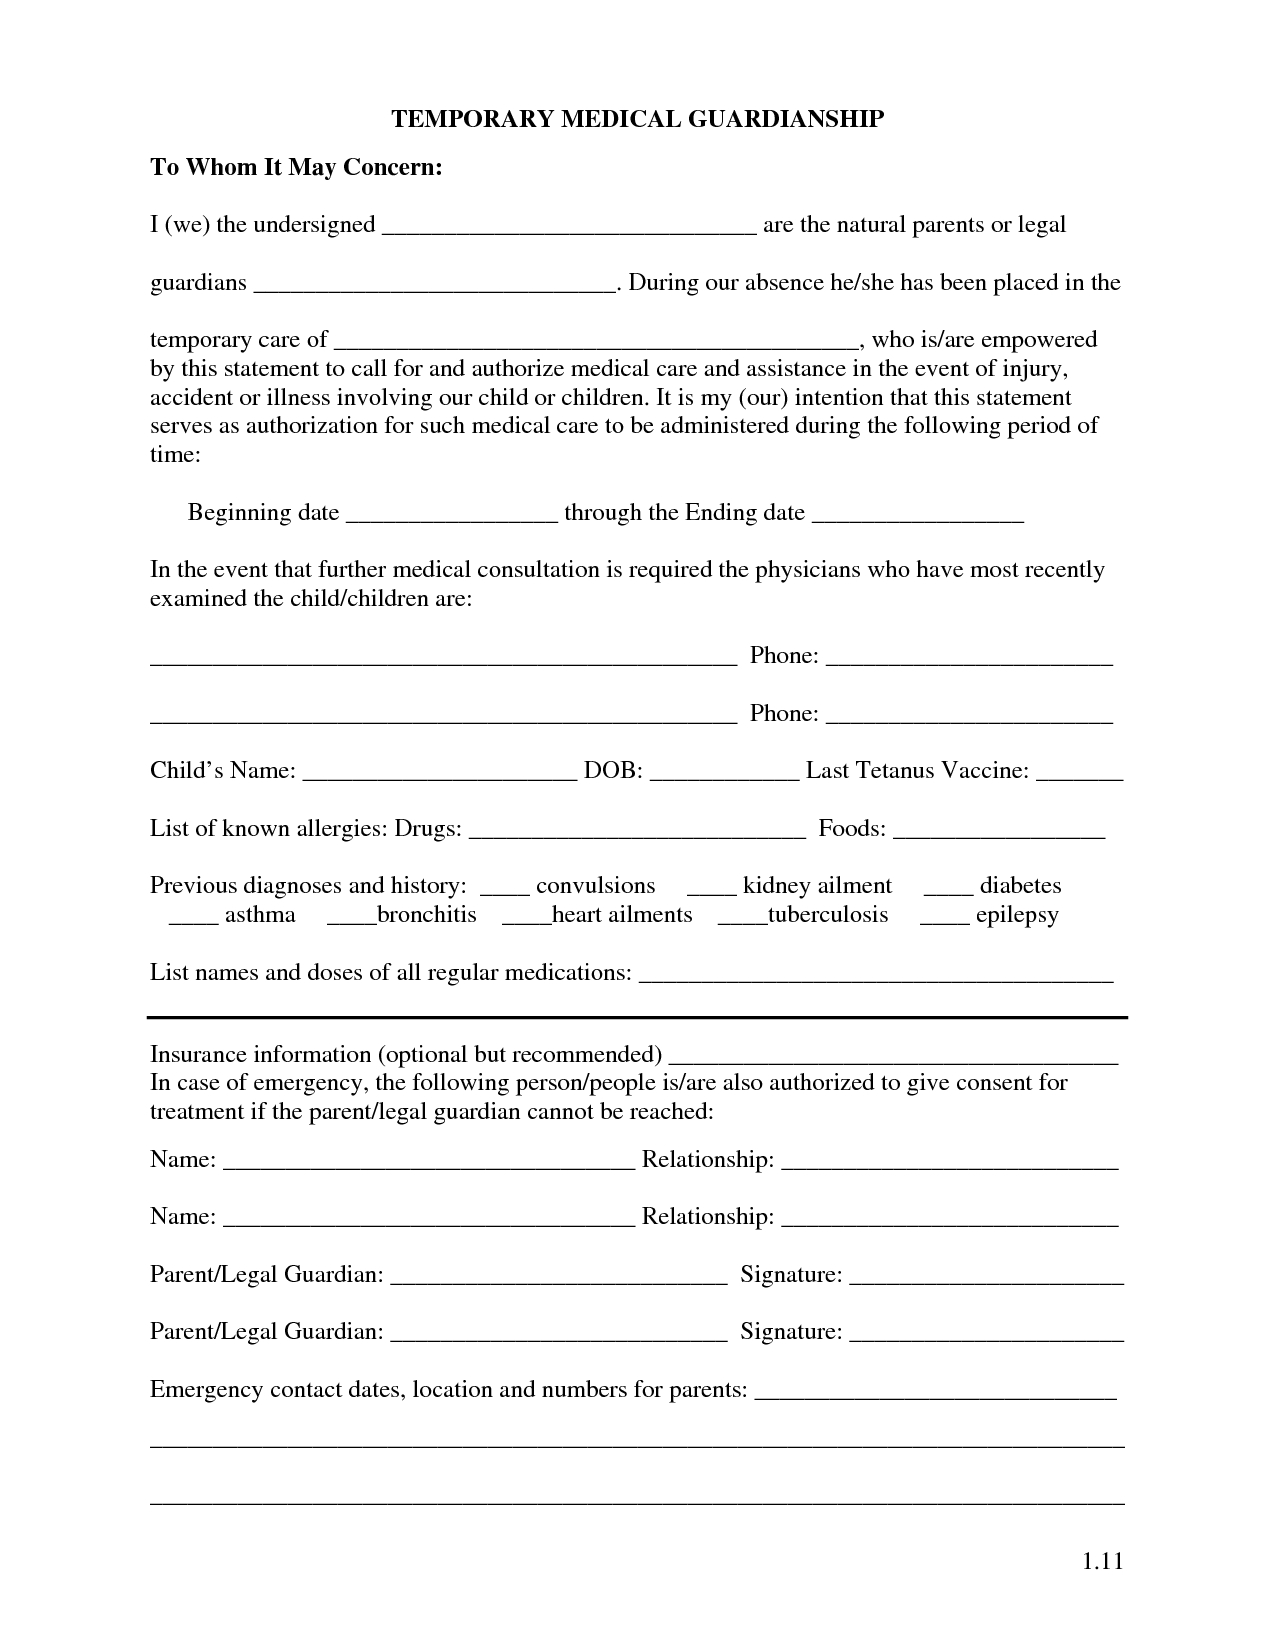 Free Printable Temporary Guardianship Forms   Forms - Free Printable Temporary Guardianship Form